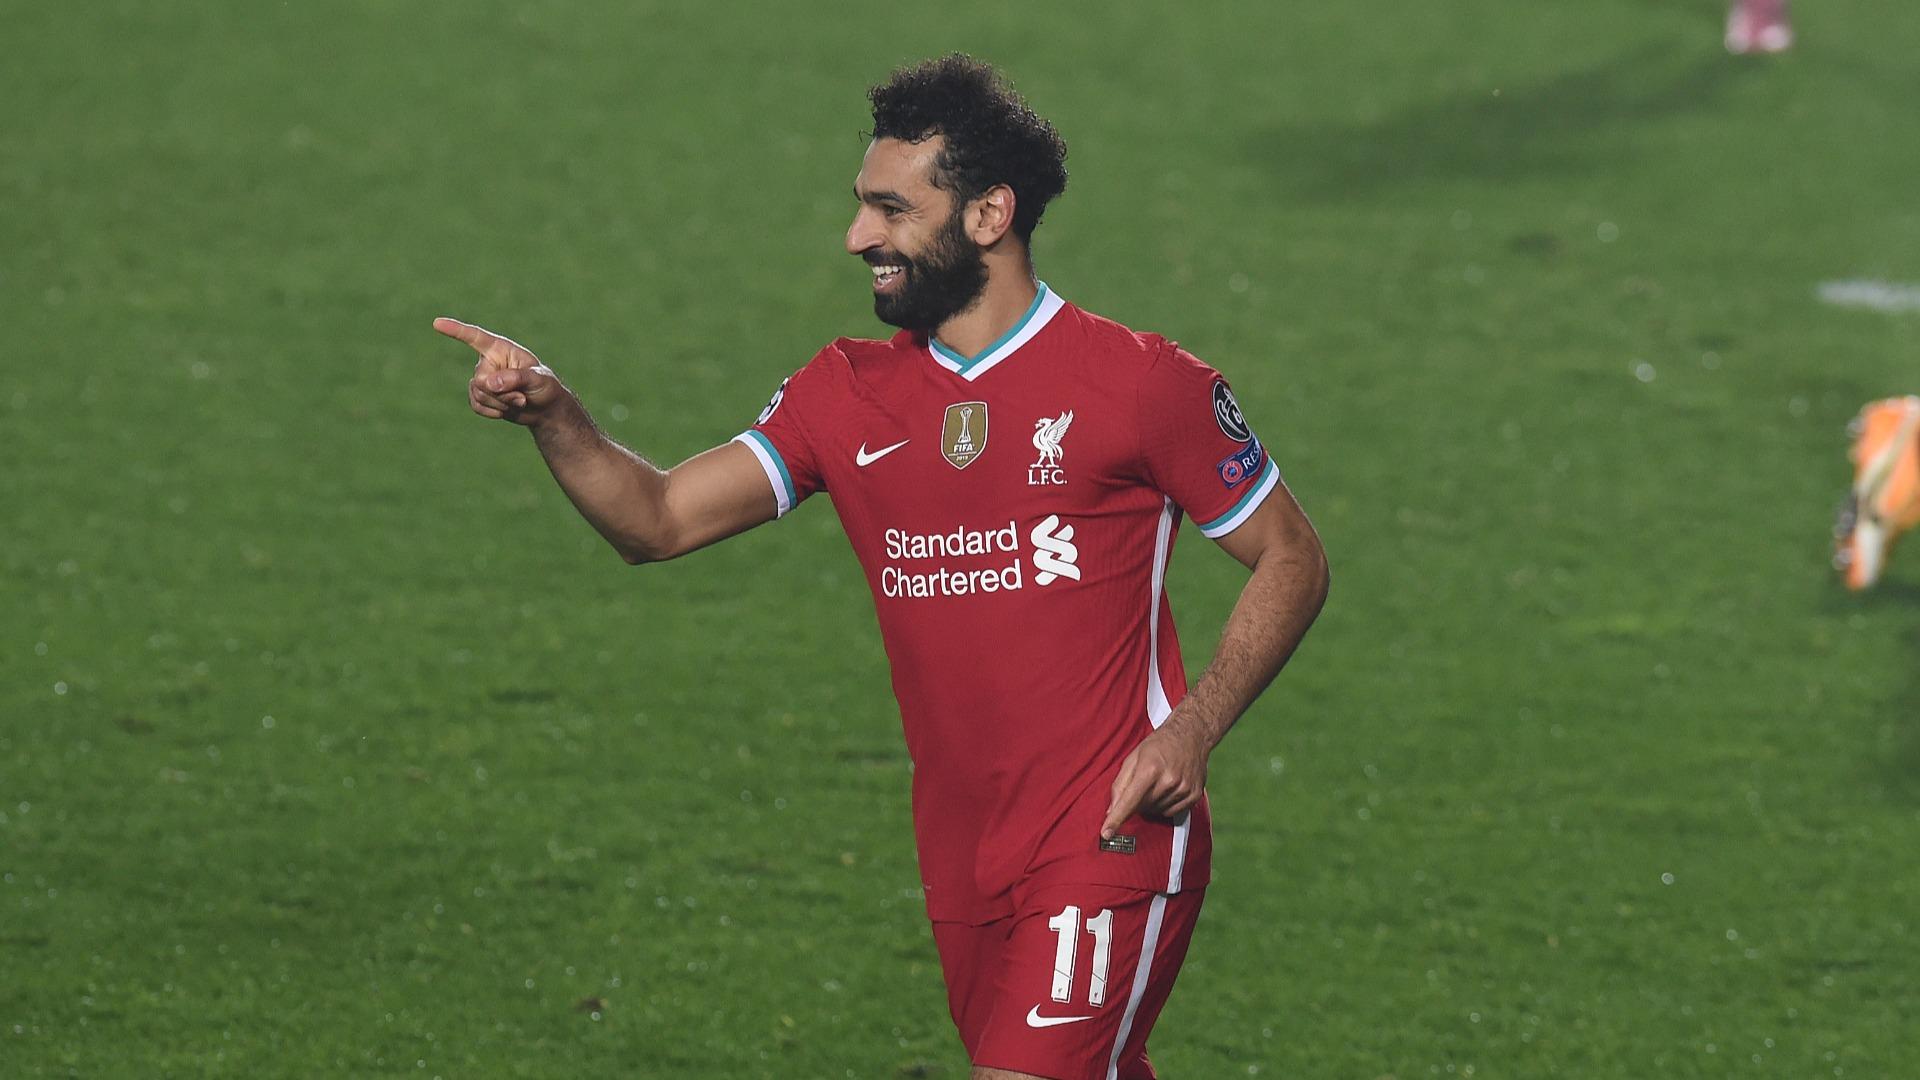 Salah equals Gerrard record as Liverpool's leading Champions League goalscorer